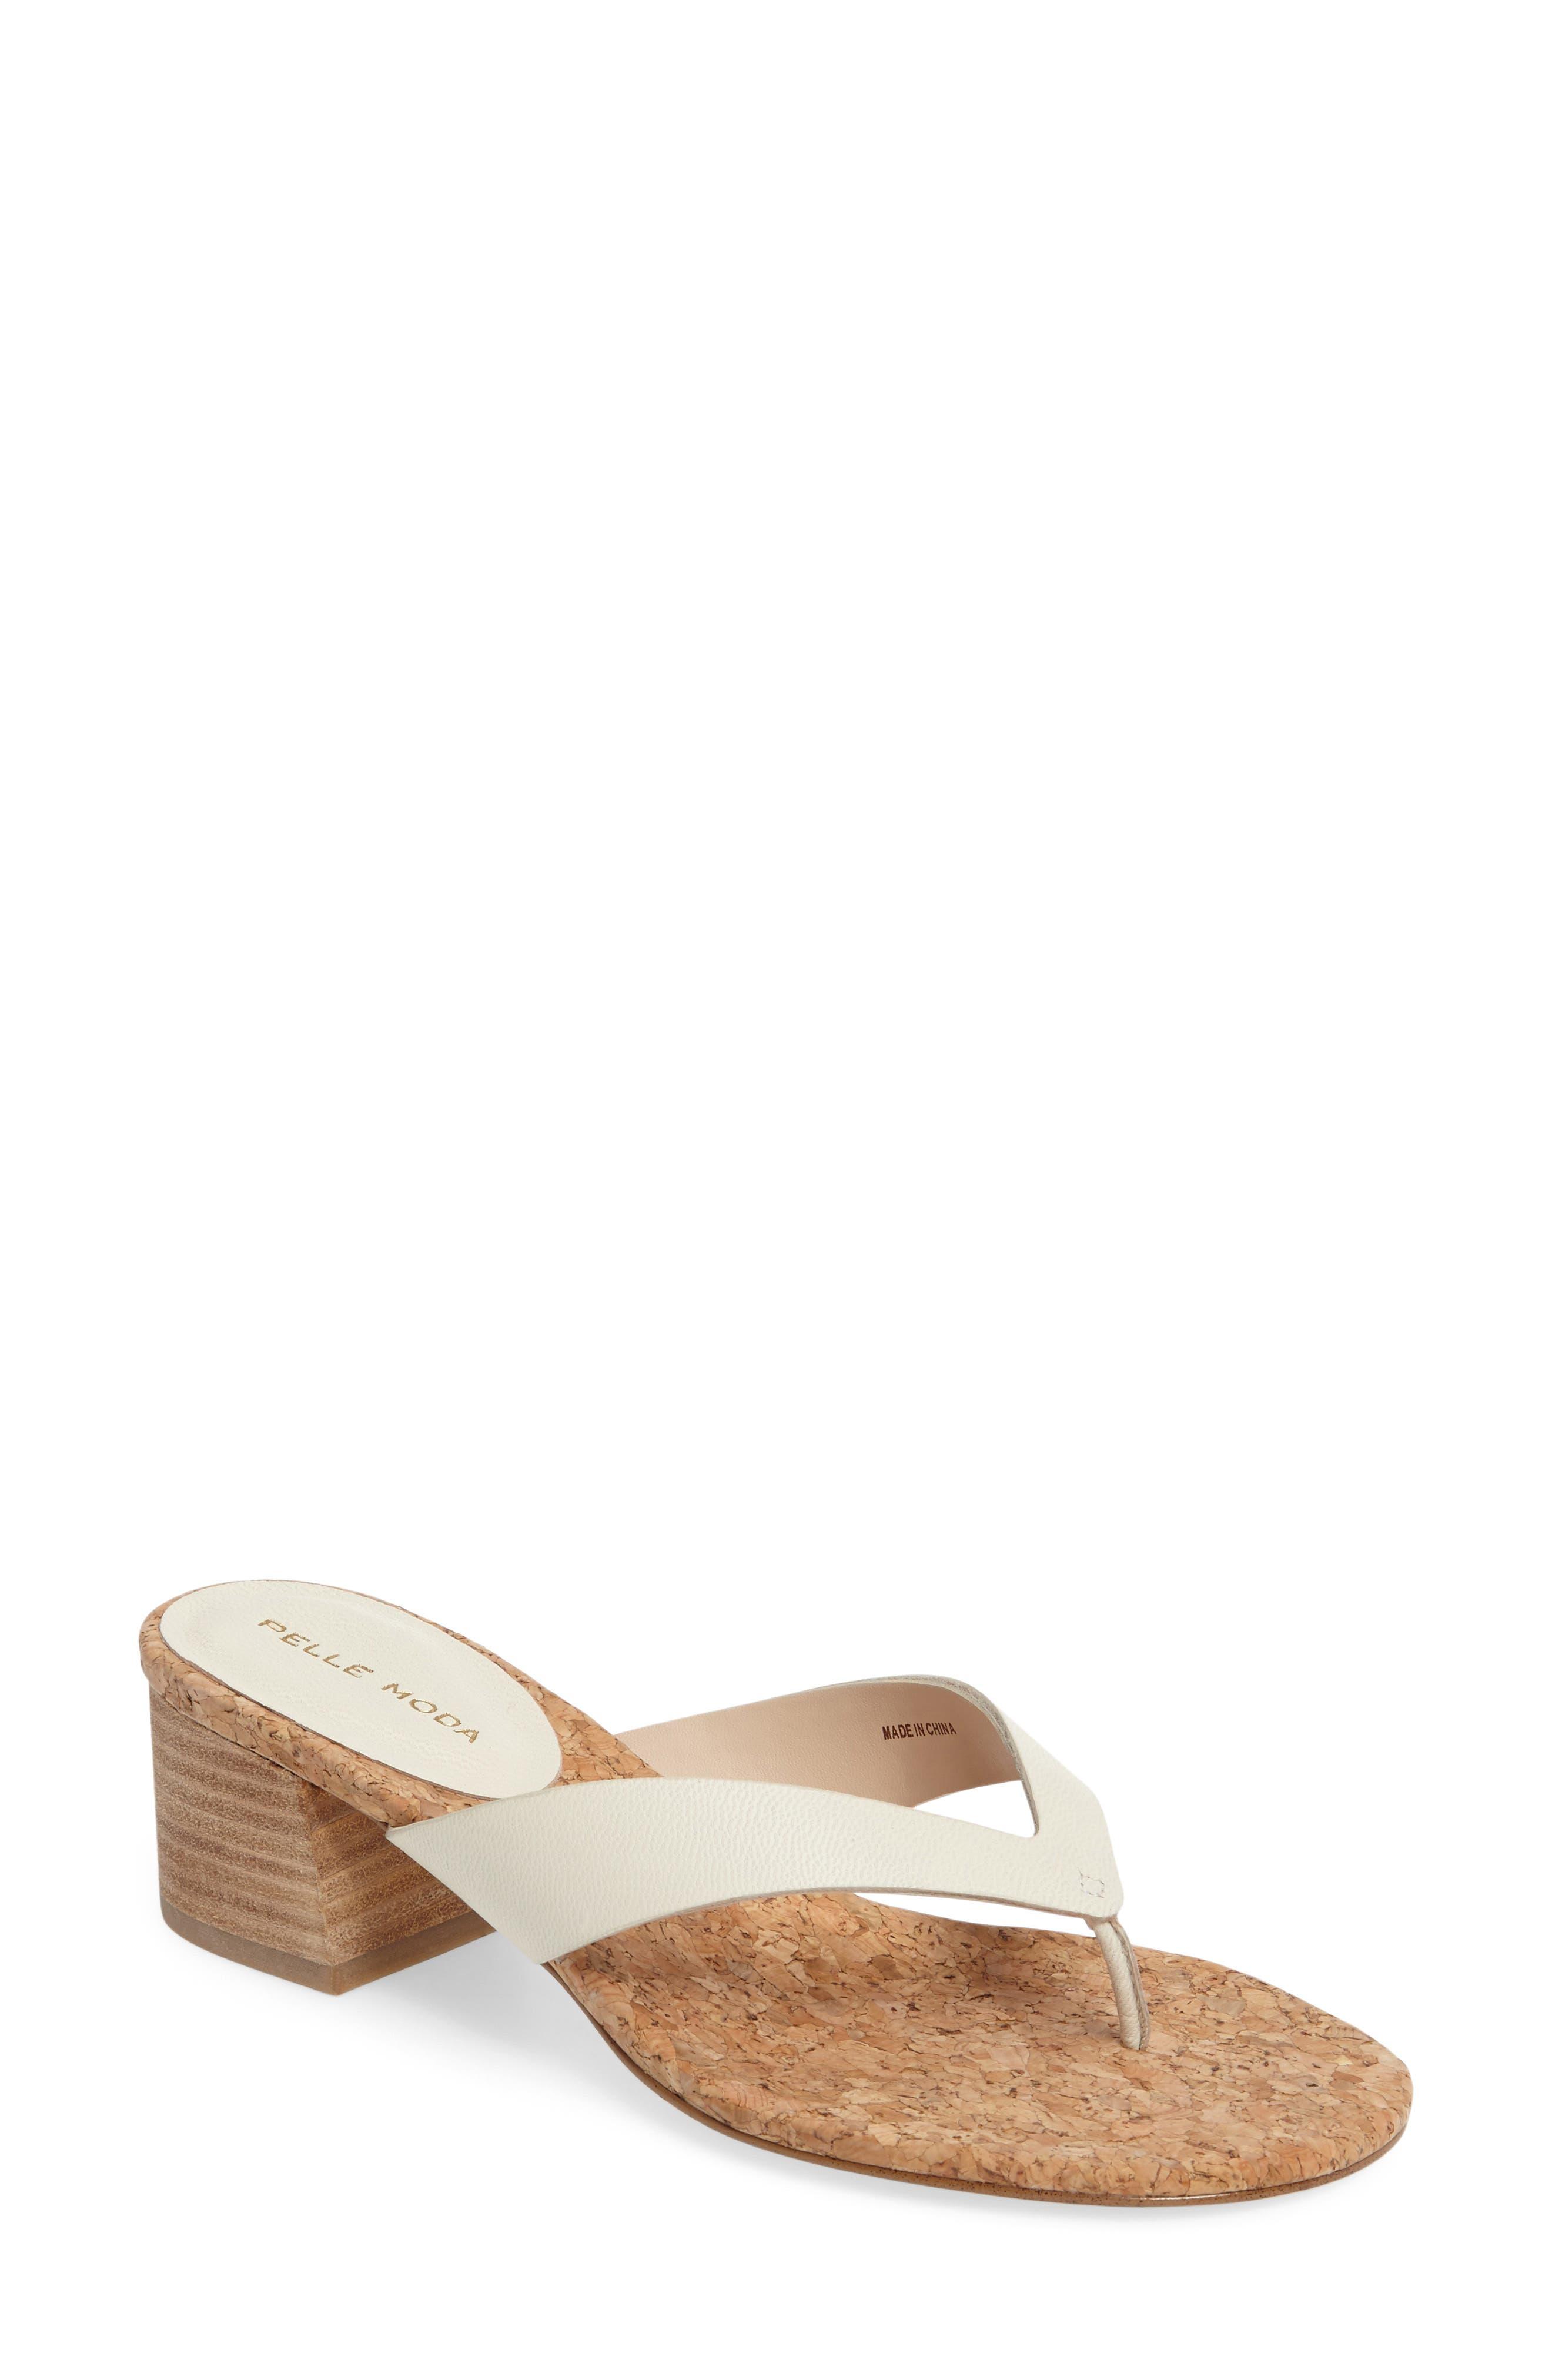 Meryl Sandal,                             Main thumbnail 1, color,                             White Leather